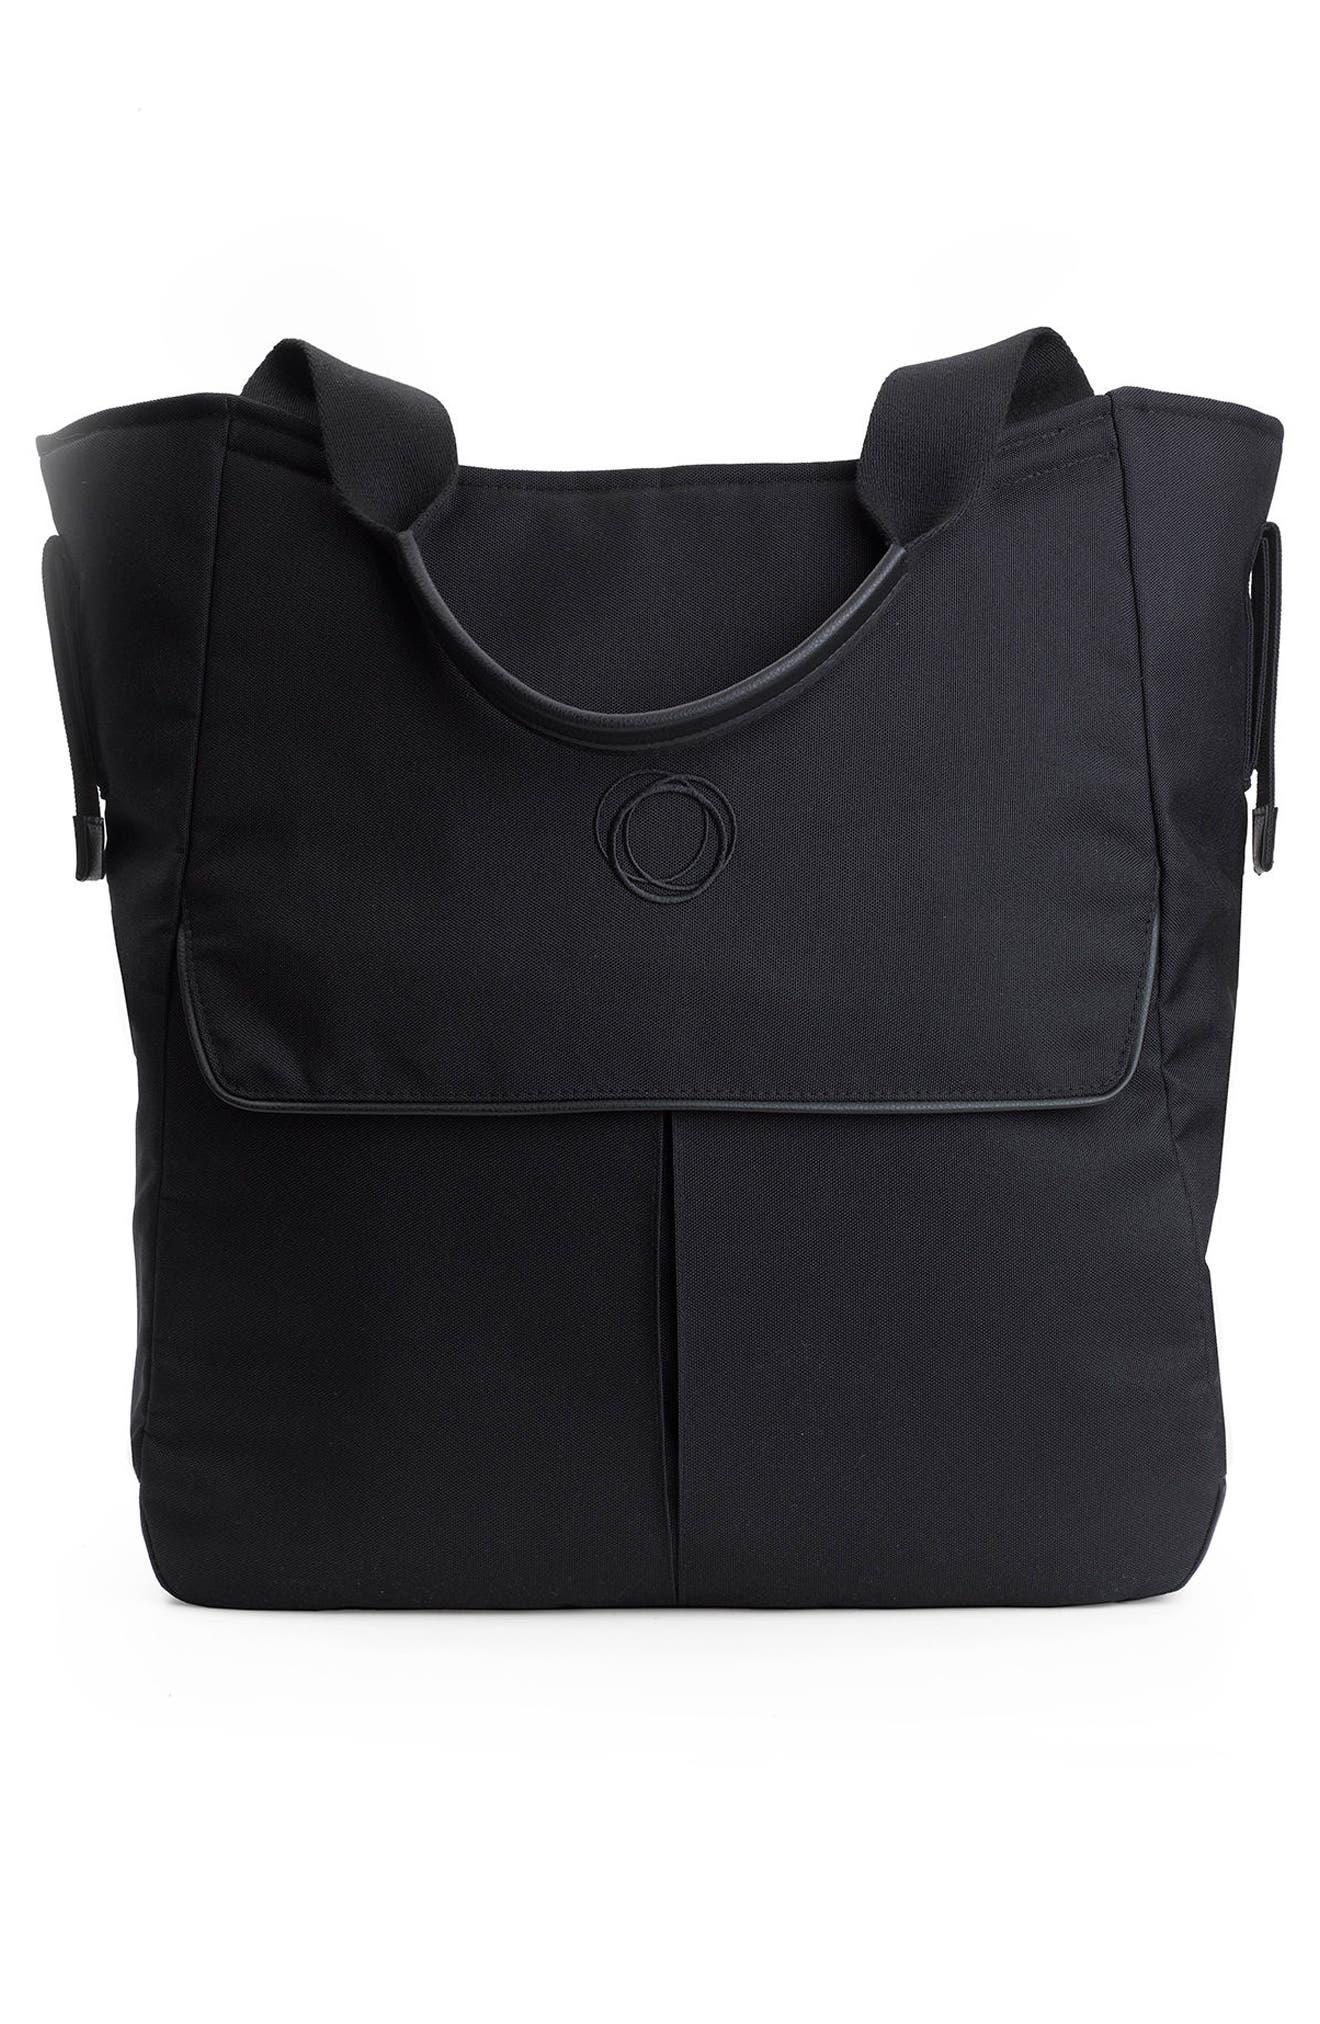 Mammoth Stroller Organizer Bag,                             Alternate thumbnail 6, color,                             Black